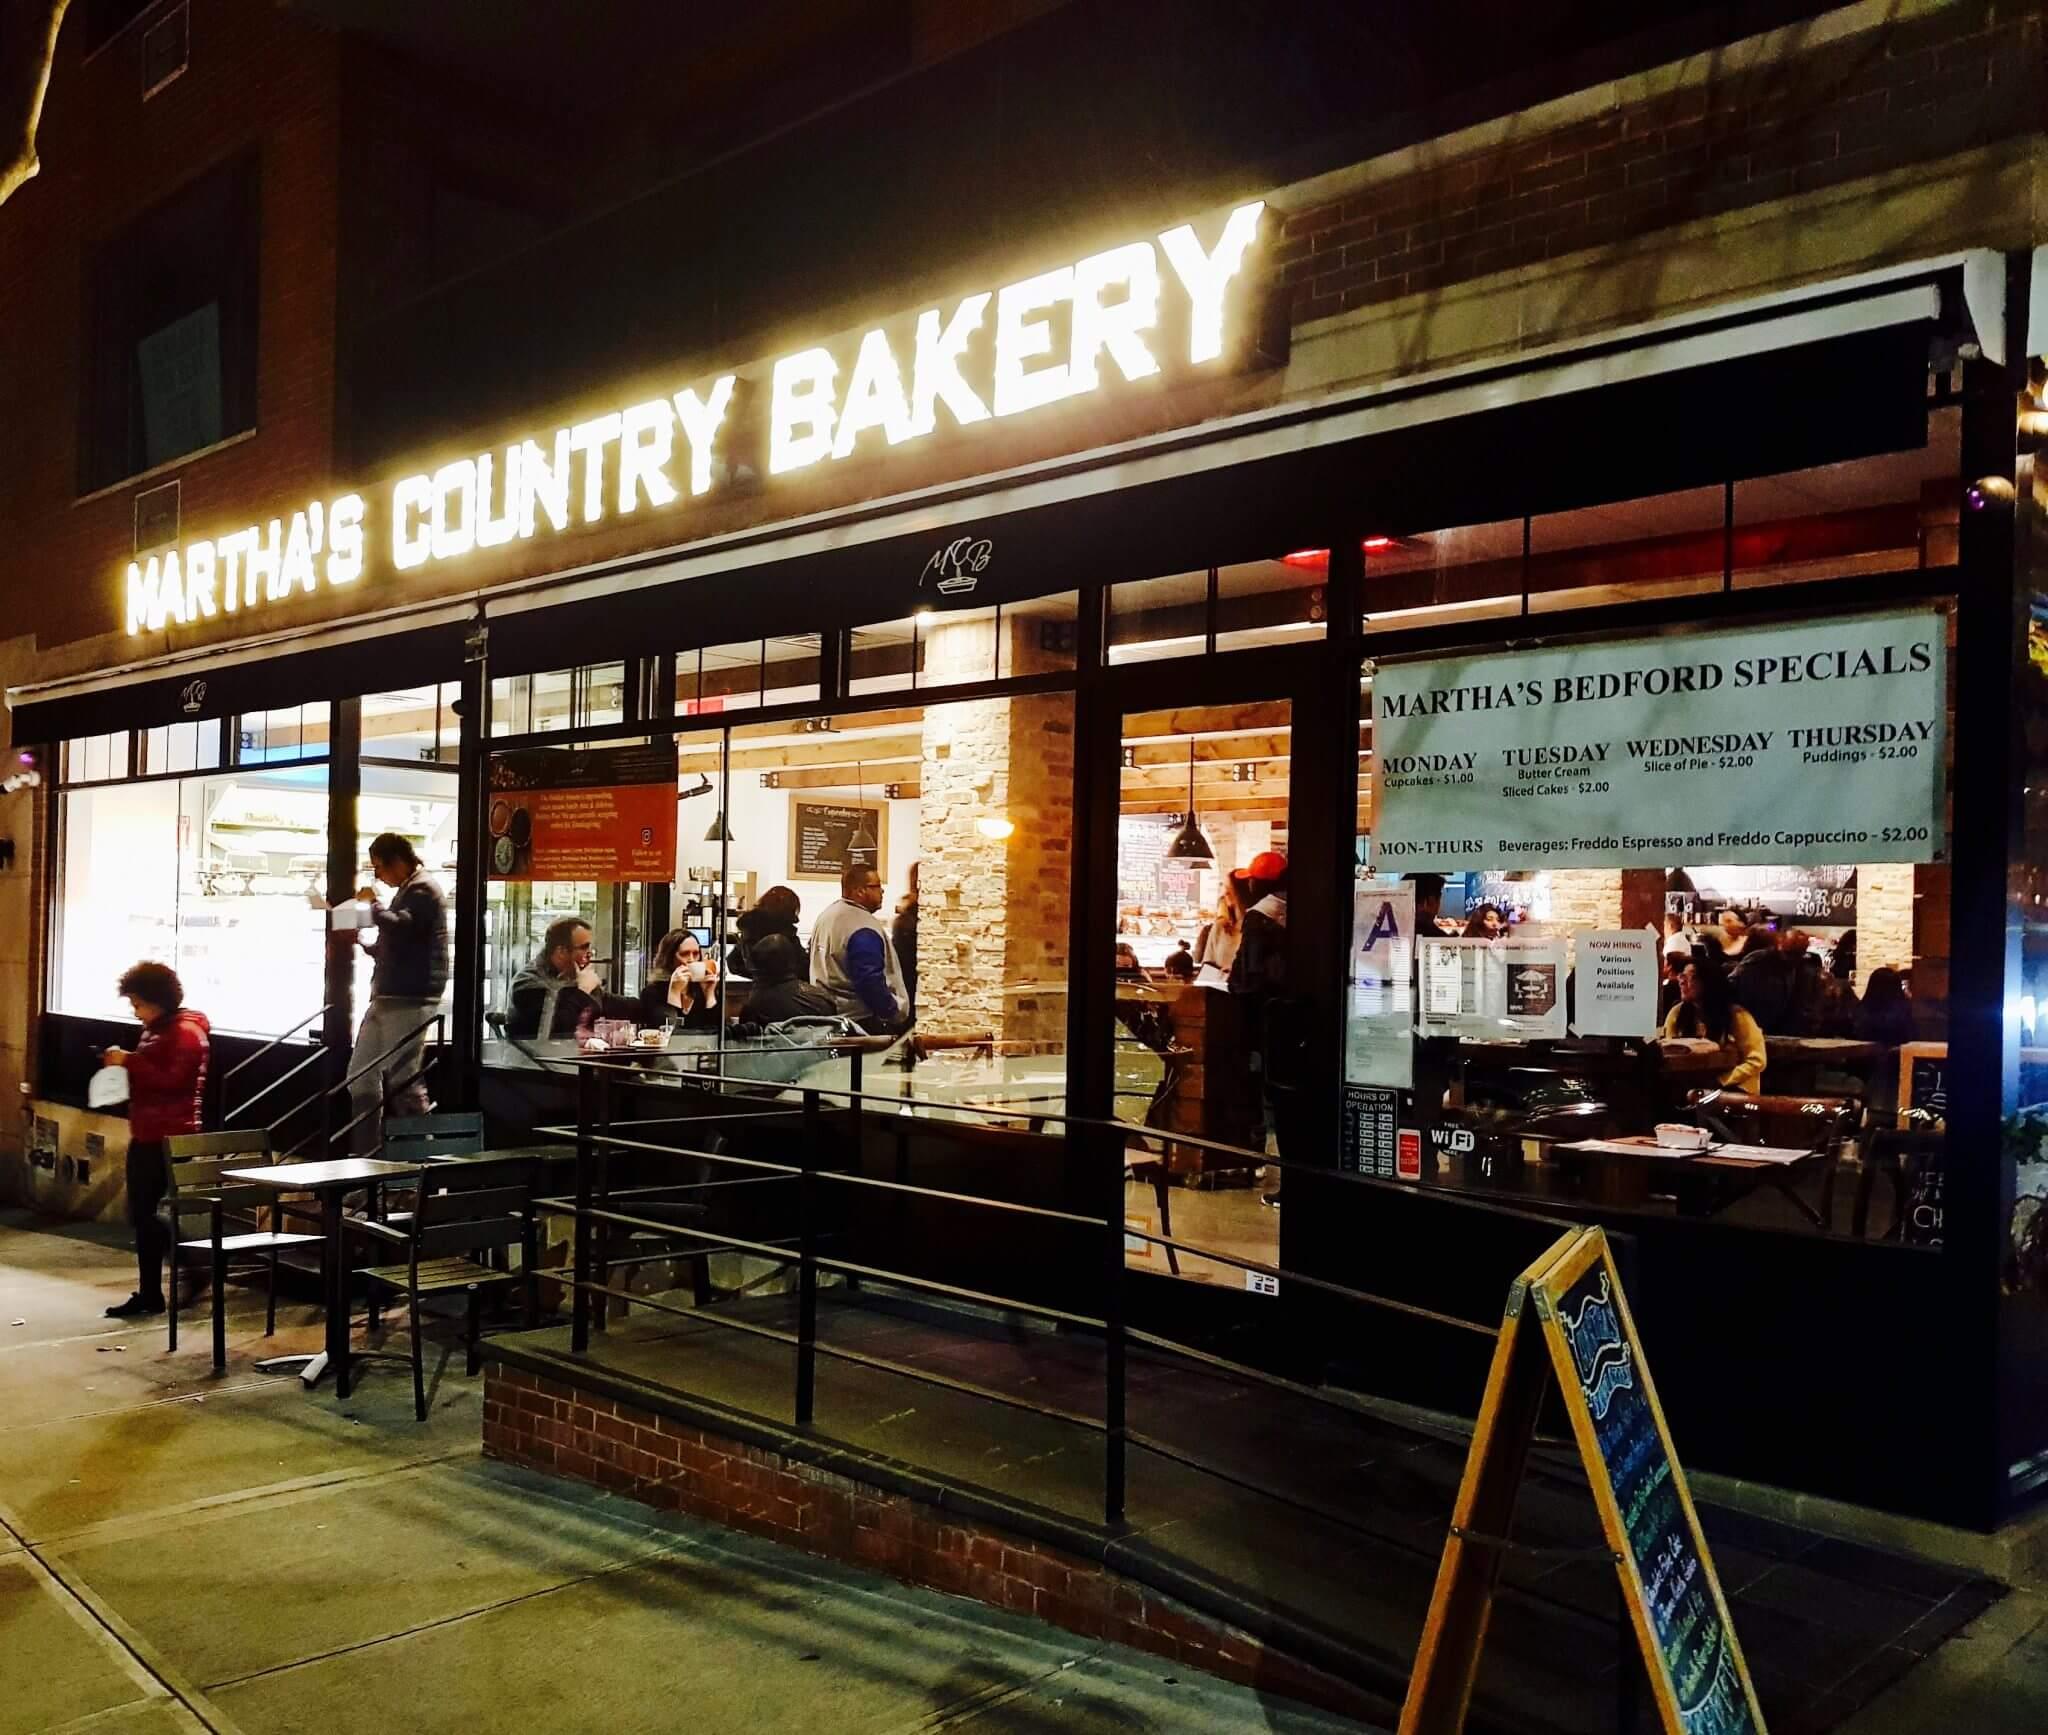 Où manger un cheesecake à New-York ? Martha's Country Bakery